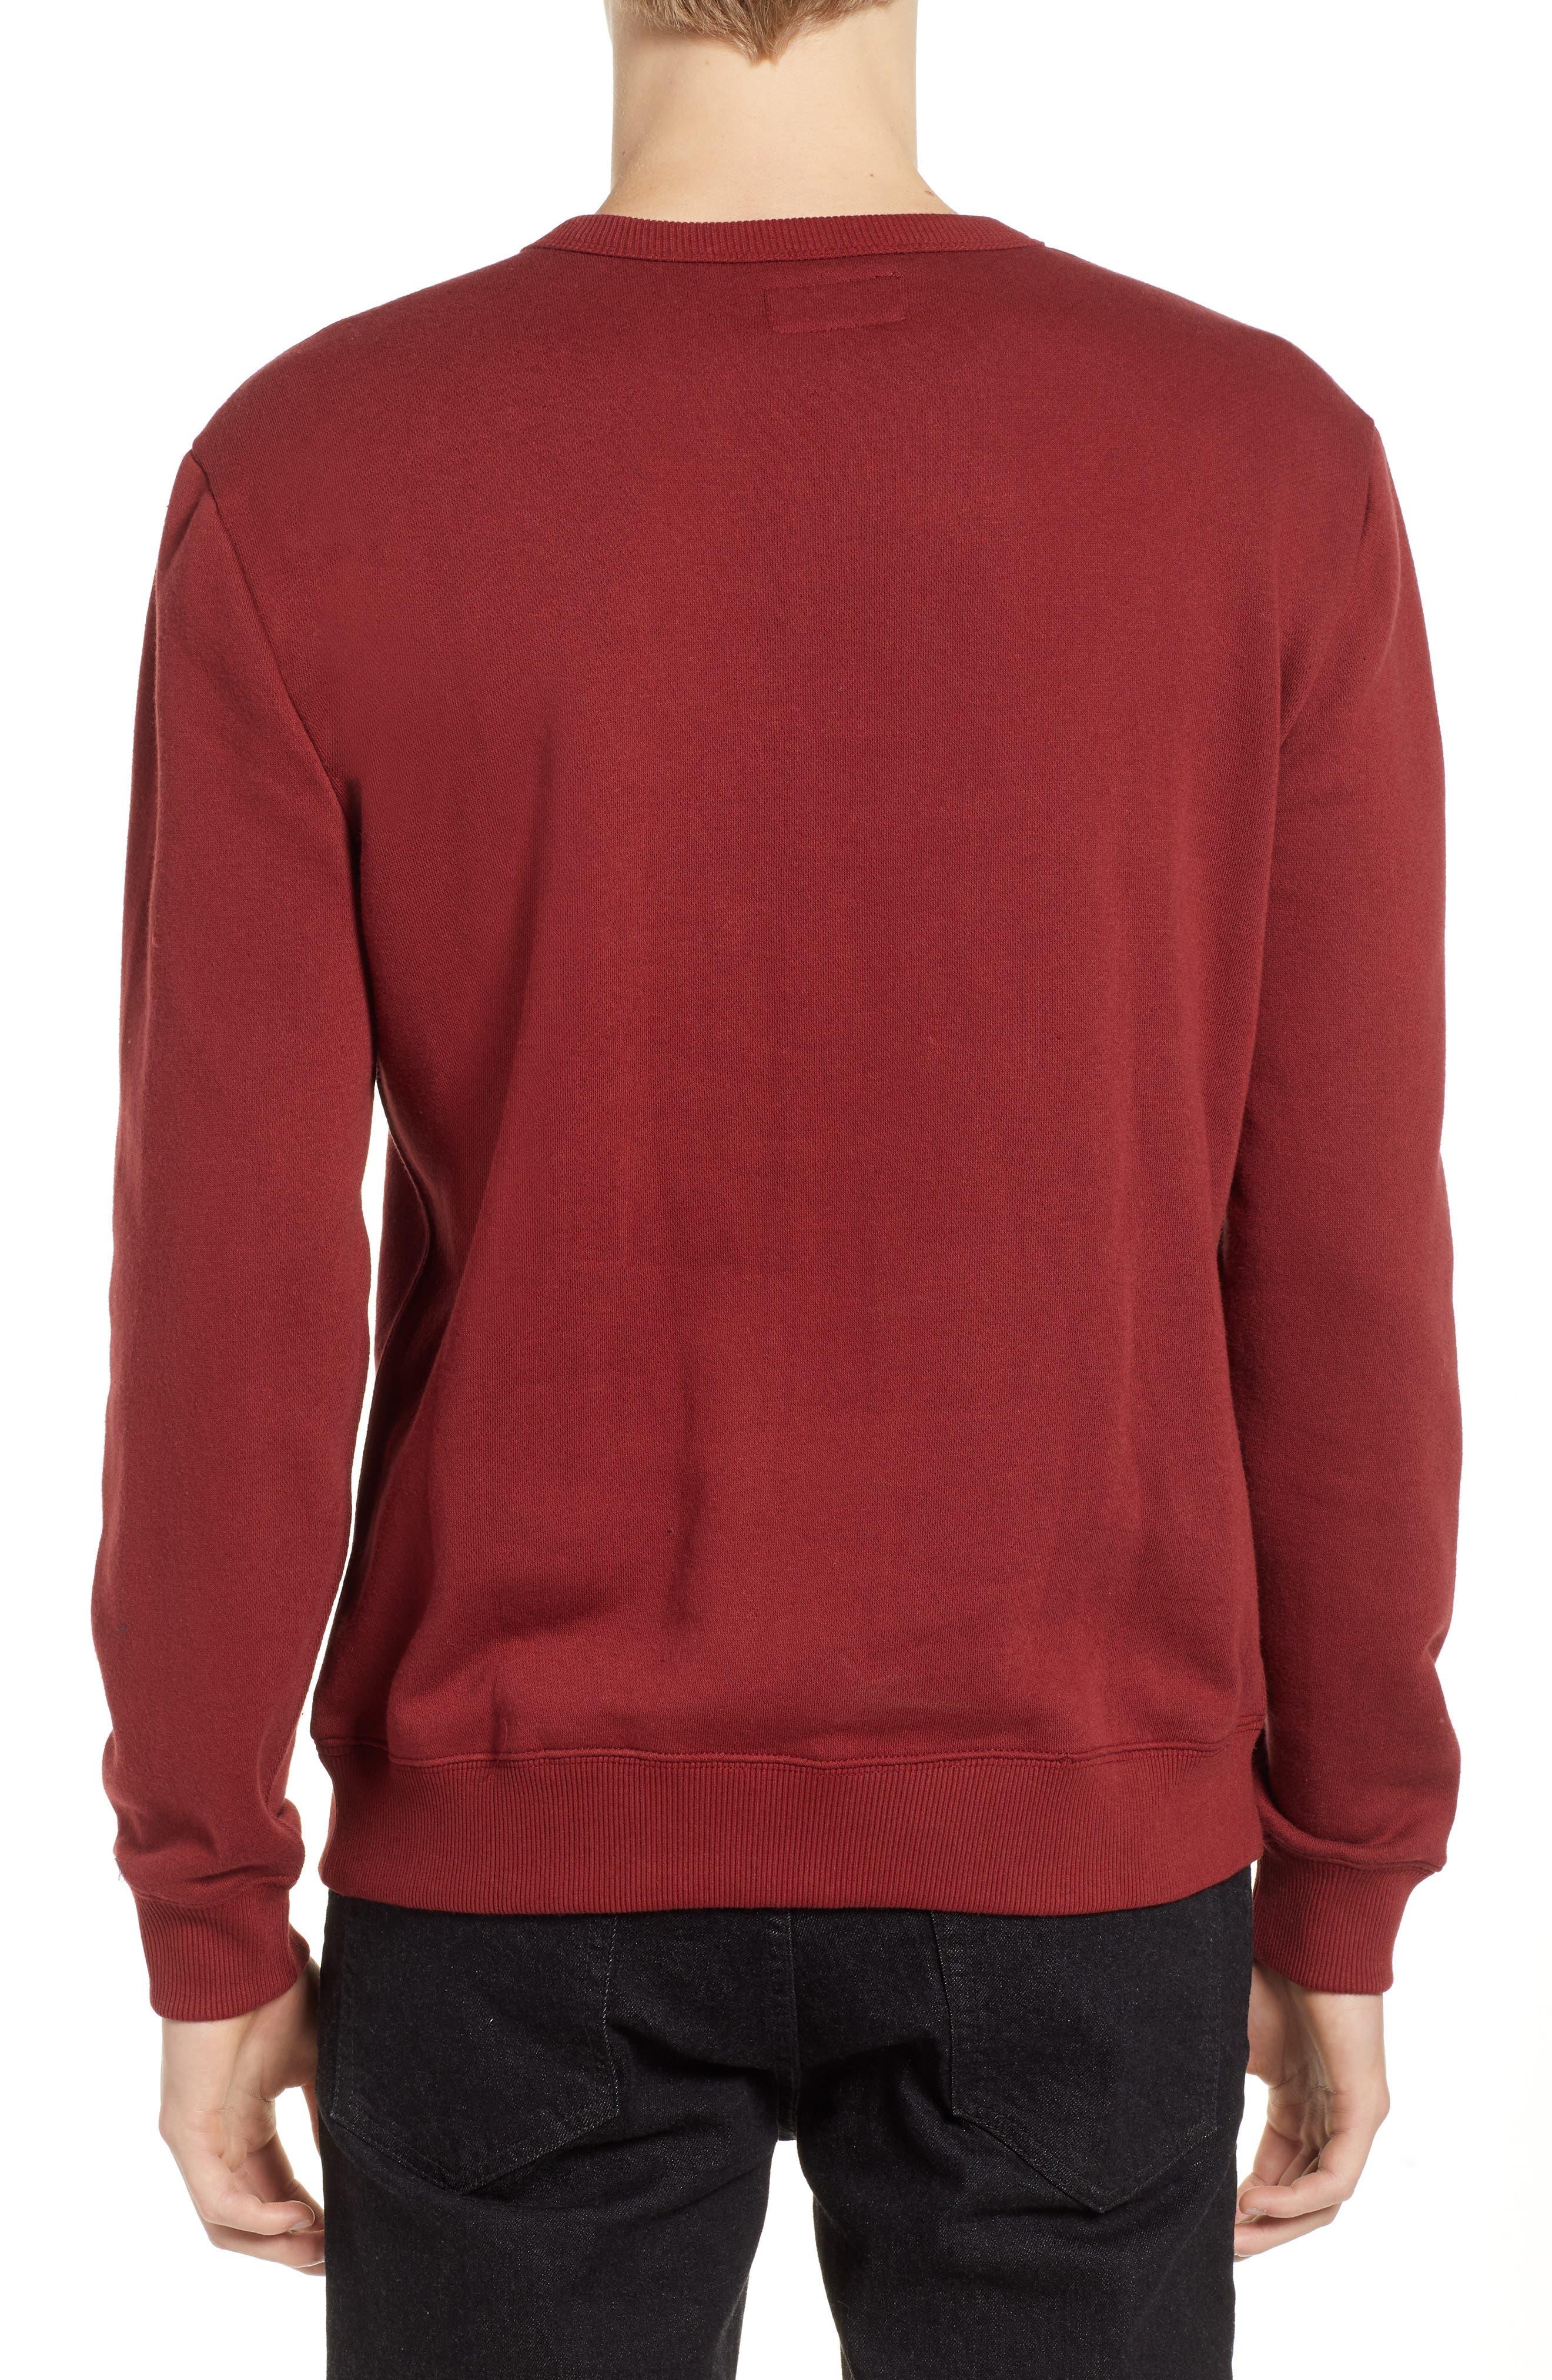 B-Shield Appliqué Crewneck Sweatshirt,                             Alternate thumbnail 2, color,                             RED